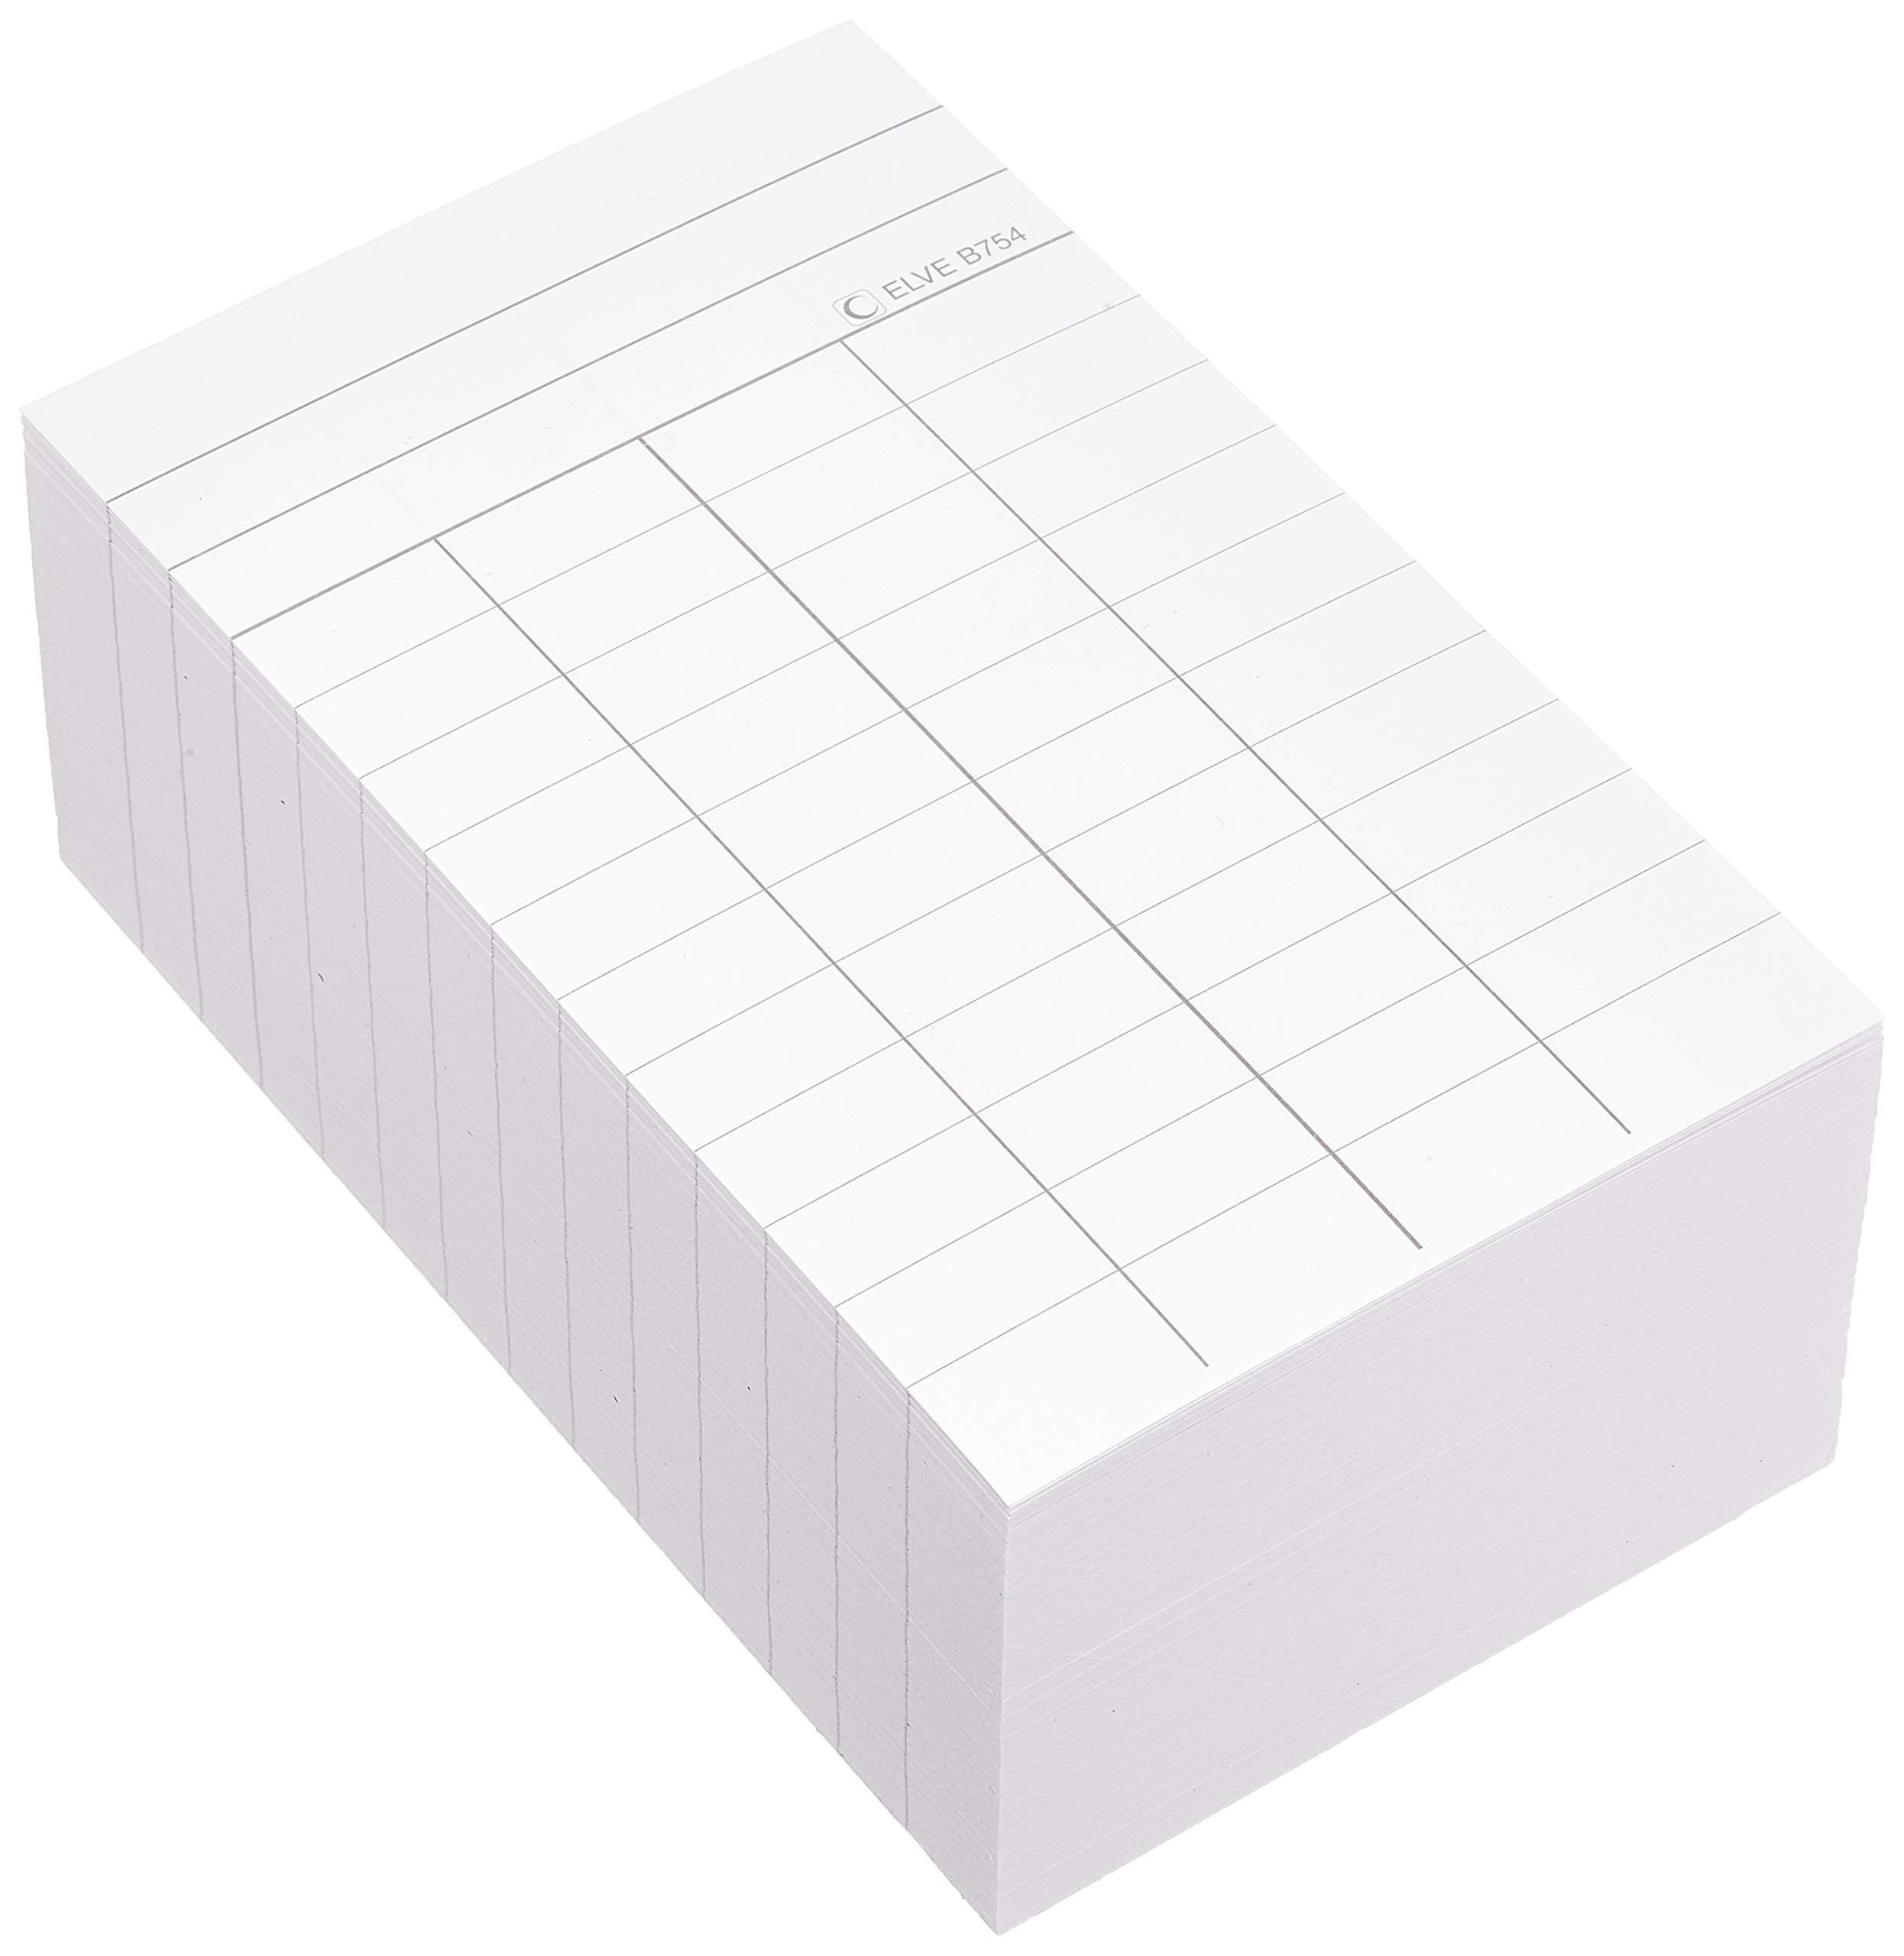 Elve 97539Plug Library 4Columns White 75x125mm 1000Pieces